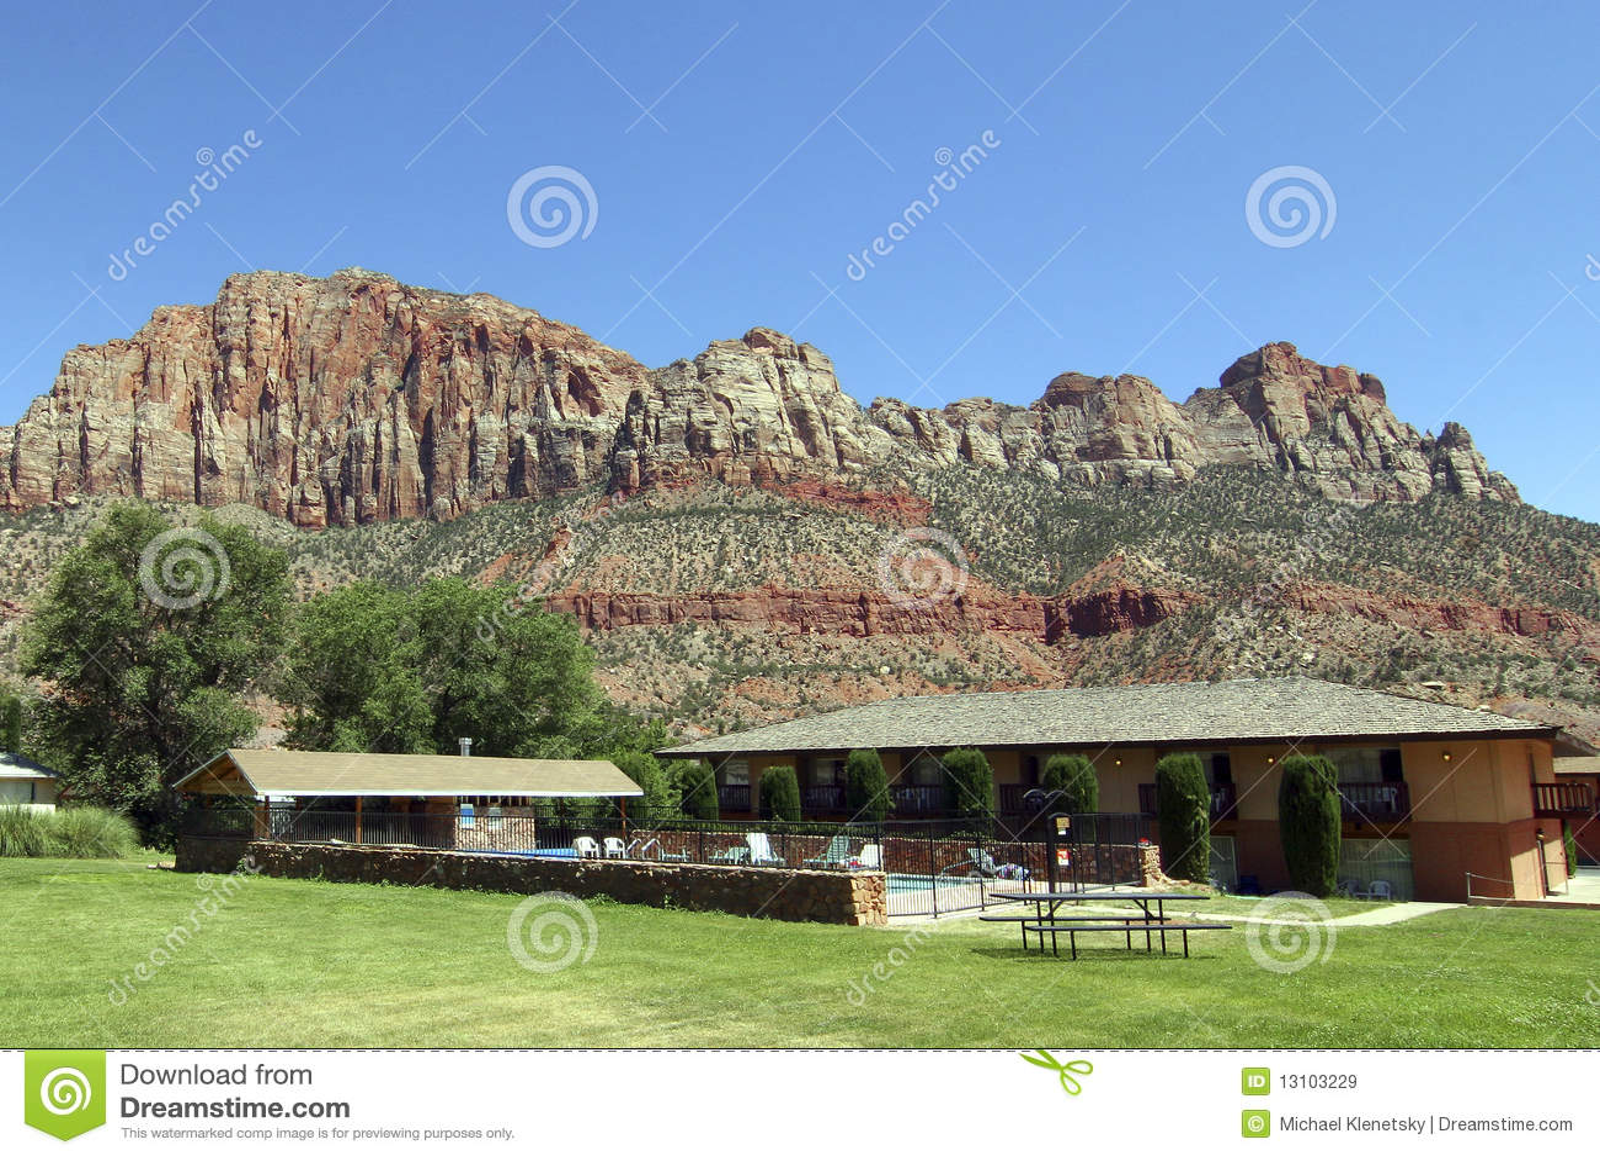 Motel rural